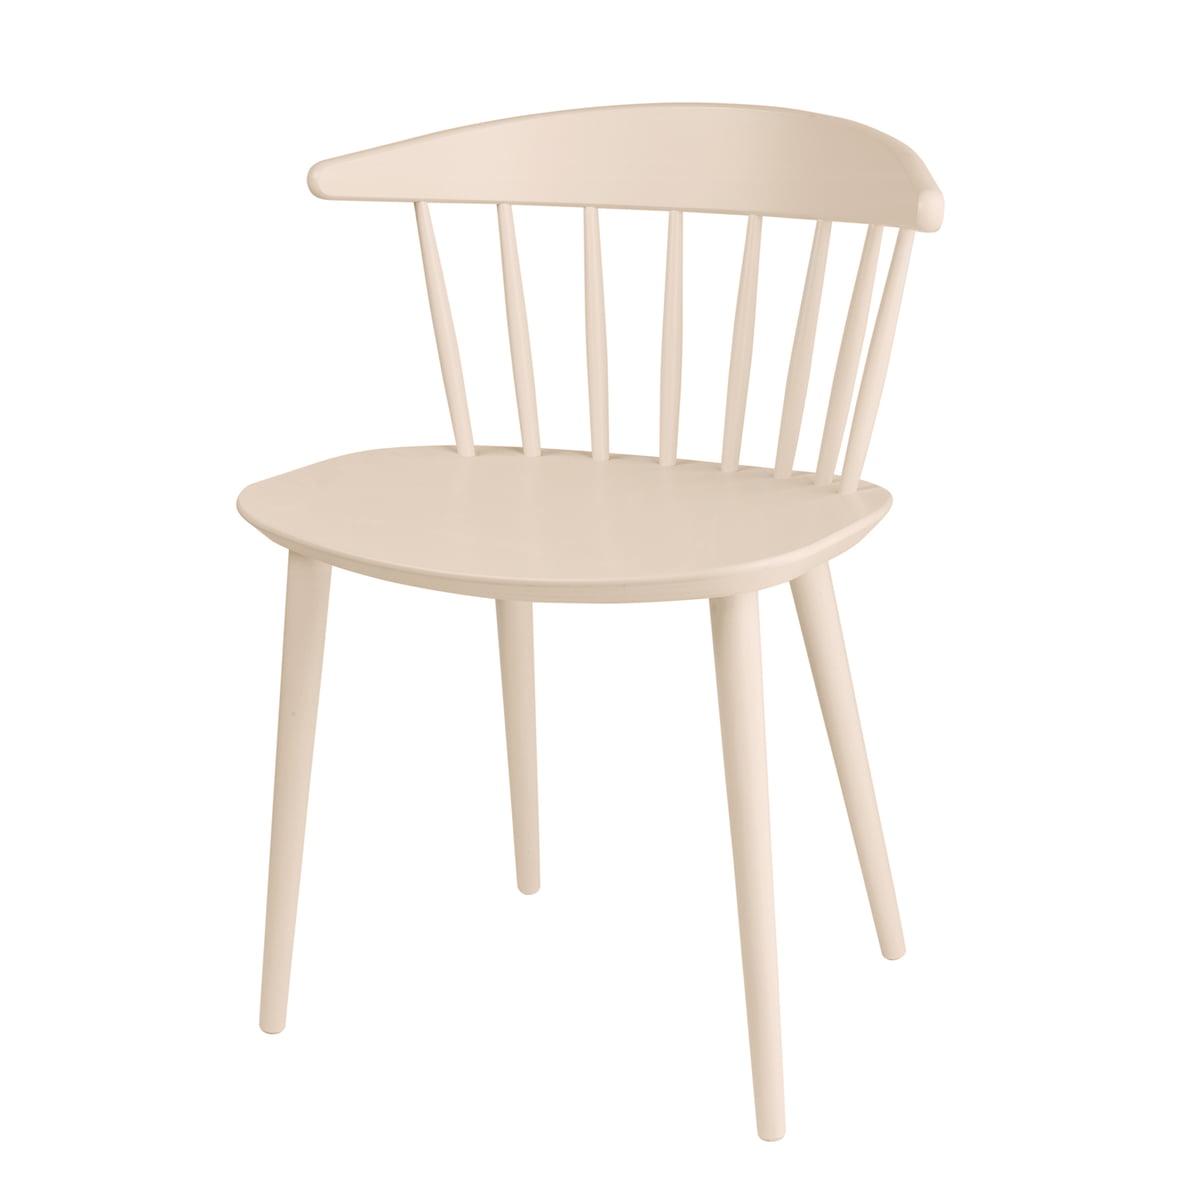 j104 chair von hay connox. Black Bedroom Furniture Sets. Home Design Ideas